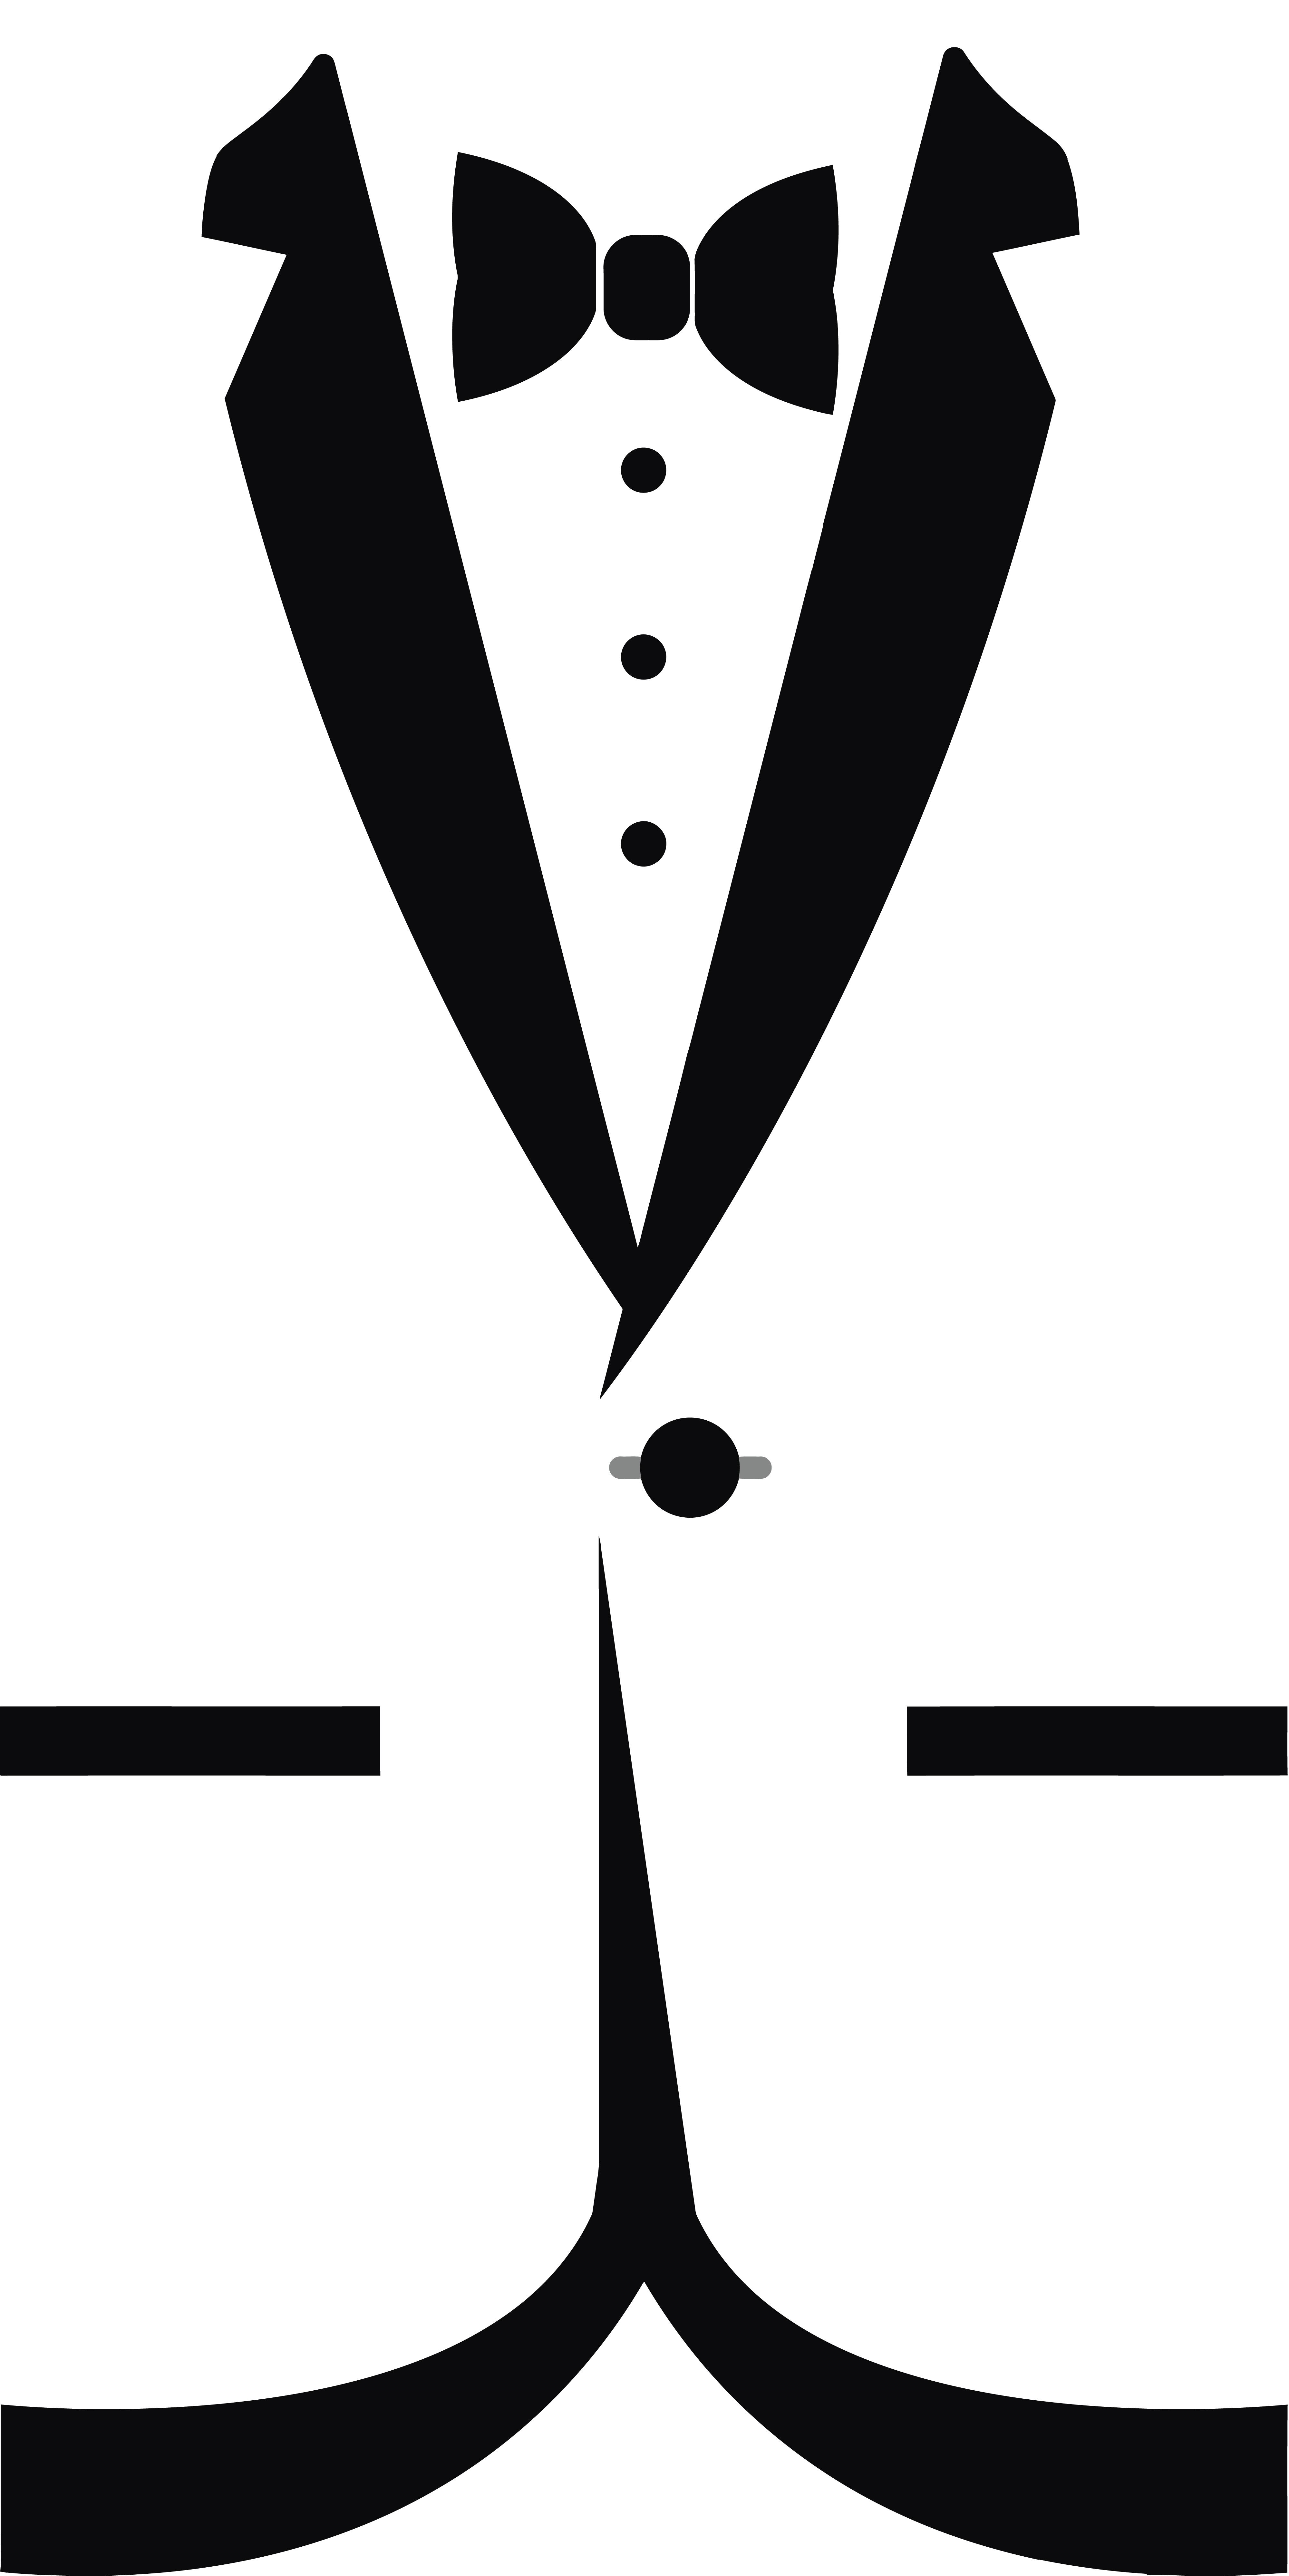 4000x7991 Tie Clipart Tuxedo Tie